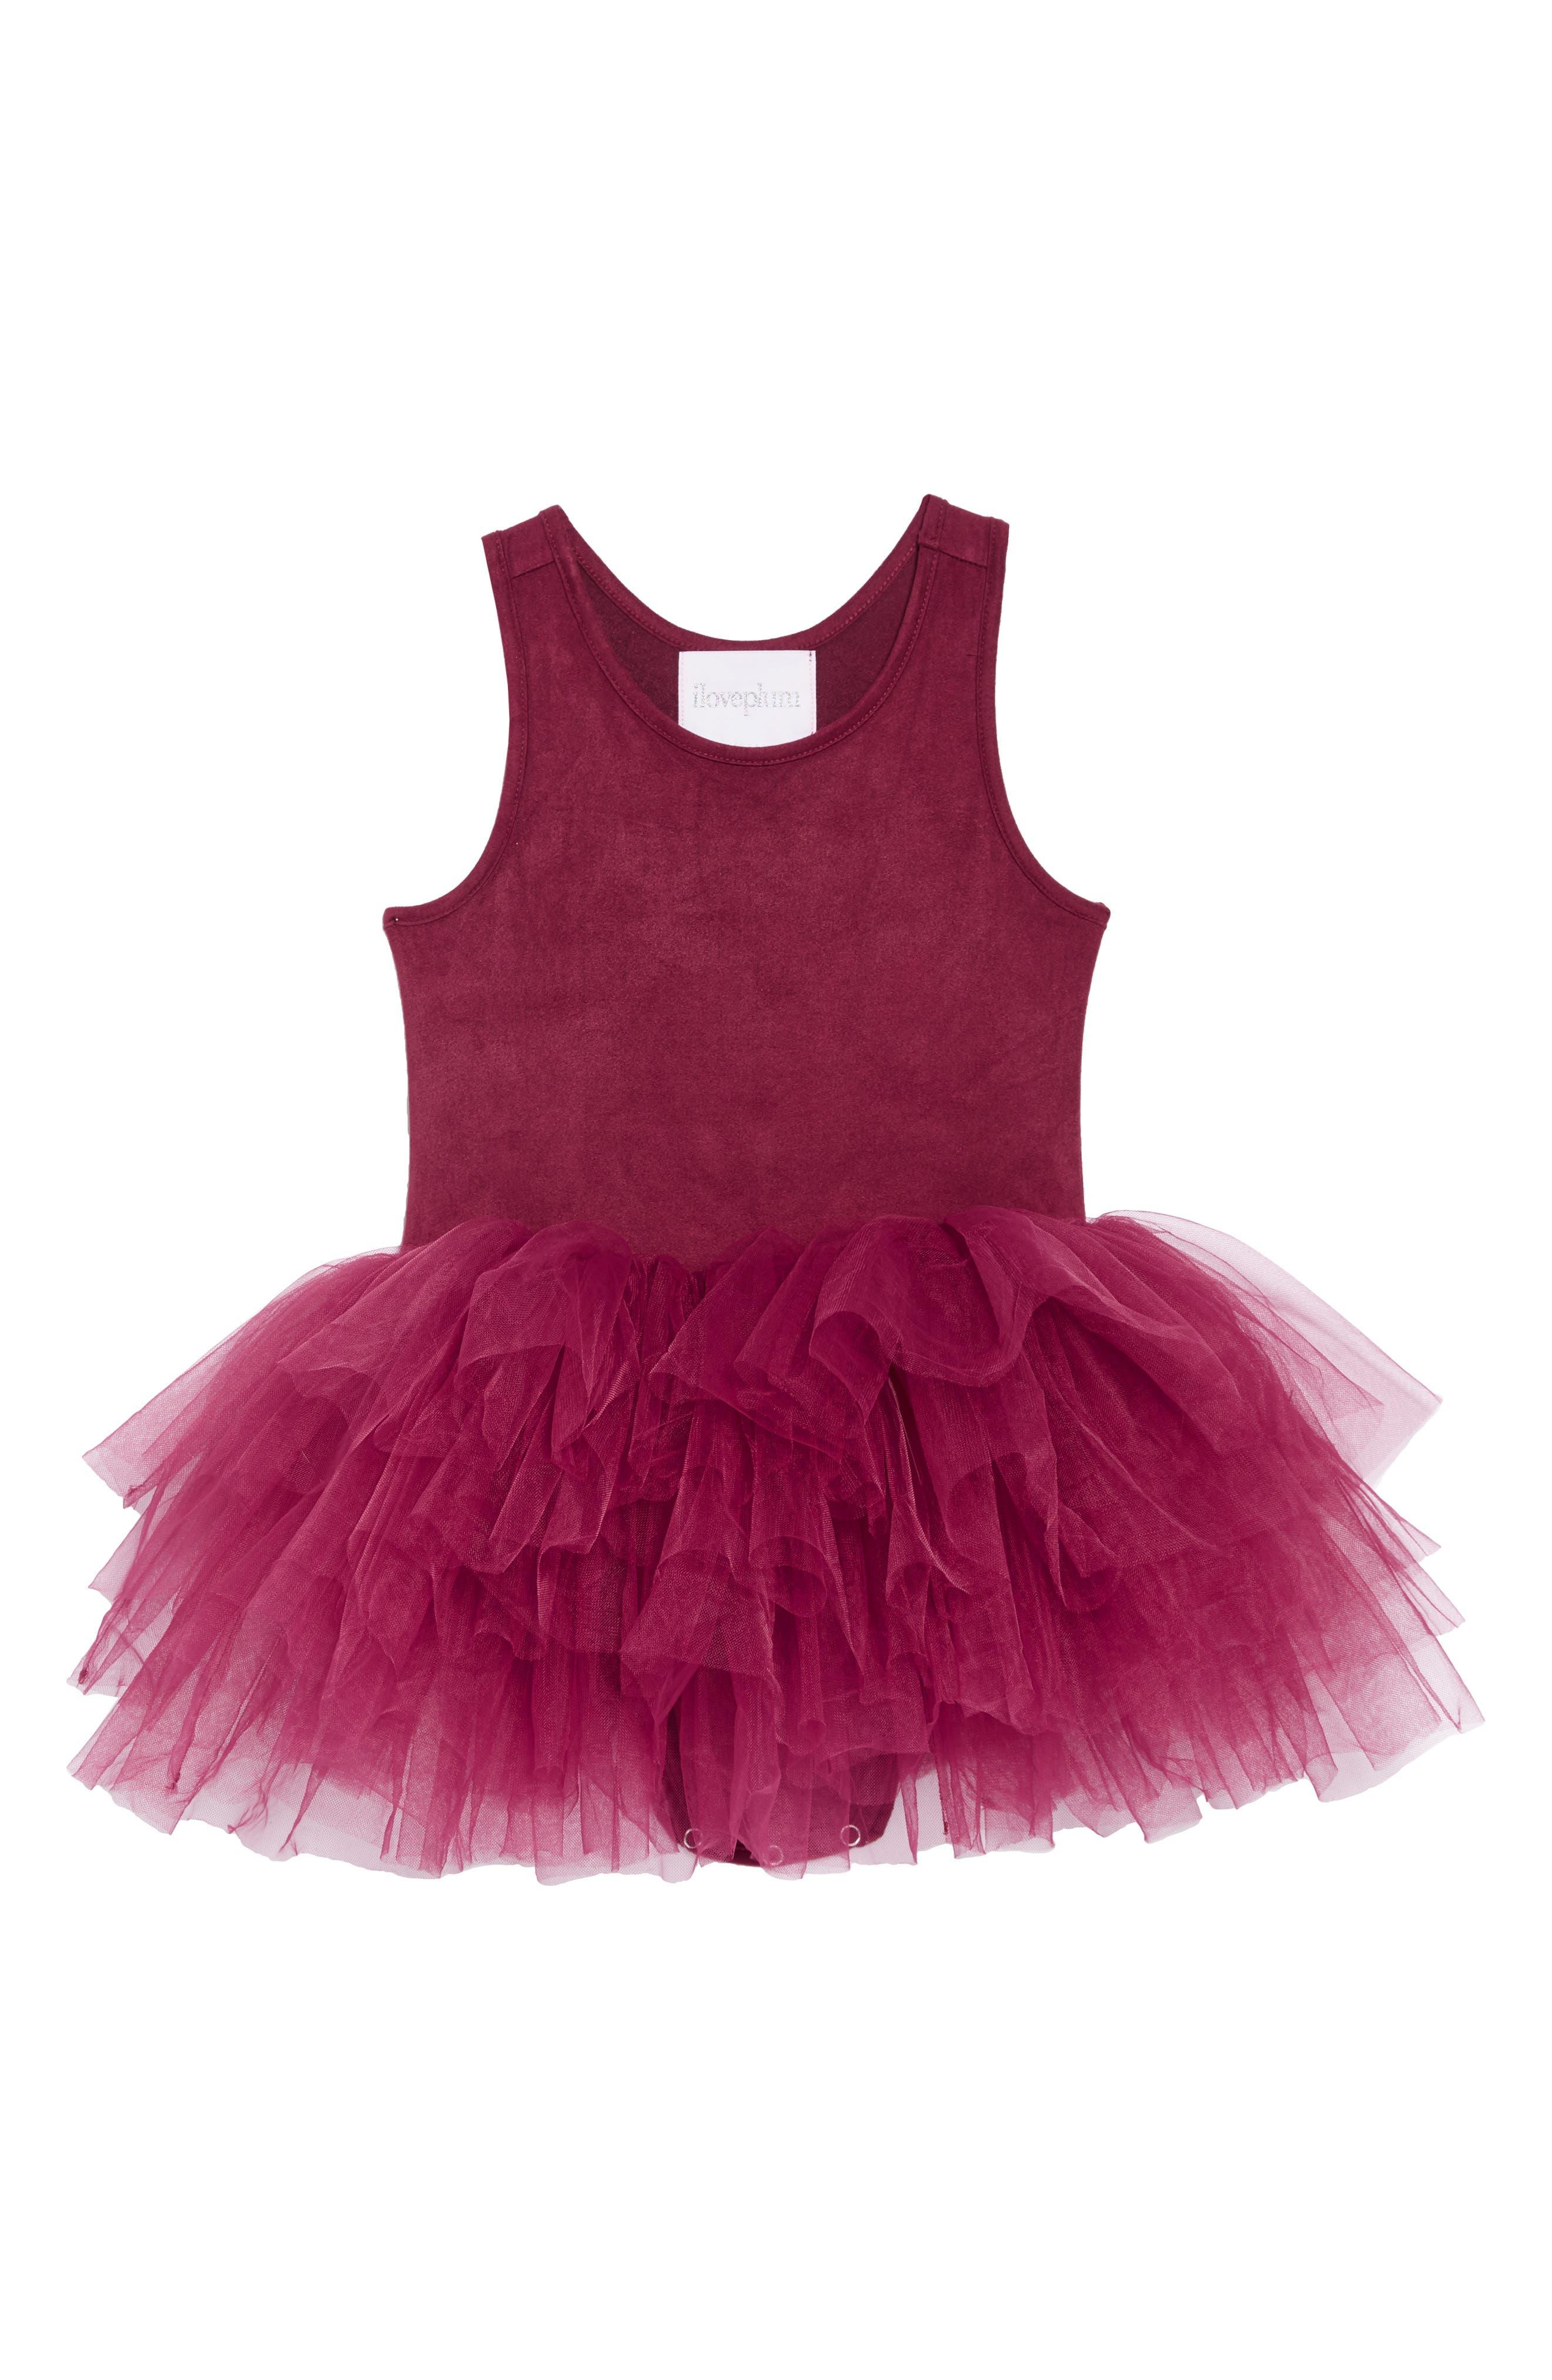 Girls Iloveplum Tutu Dress